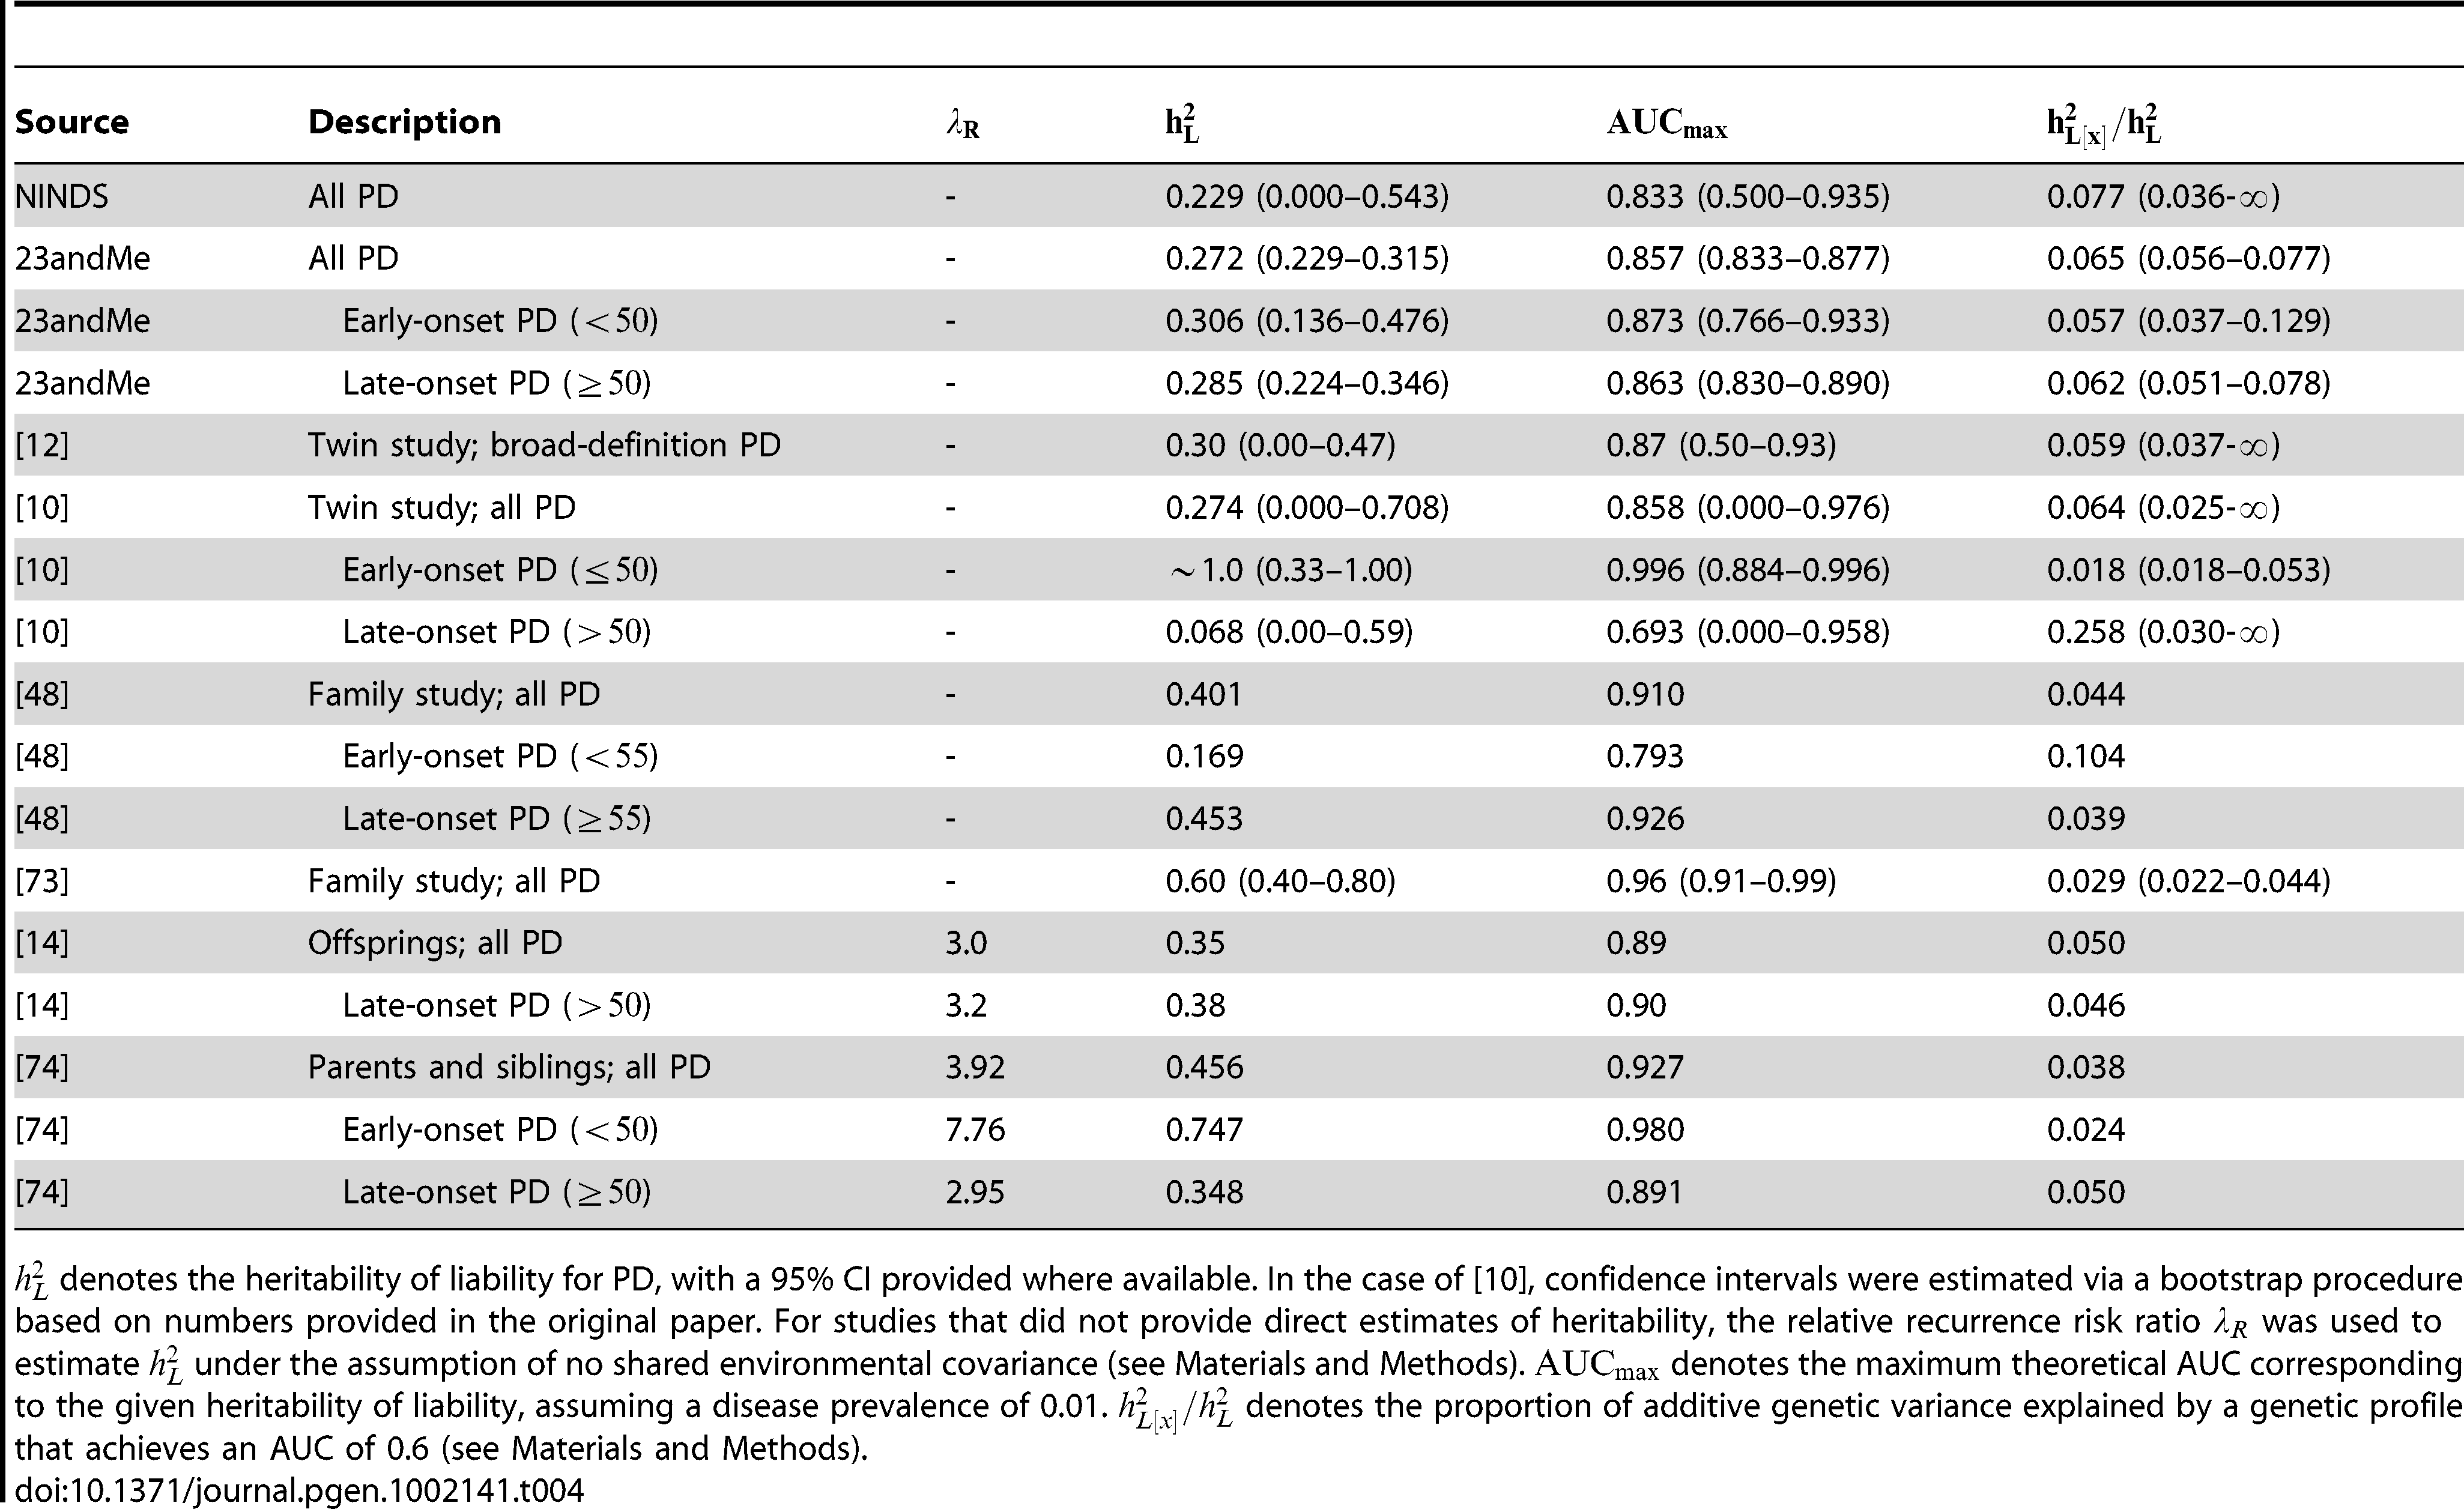 Heritability estimates.